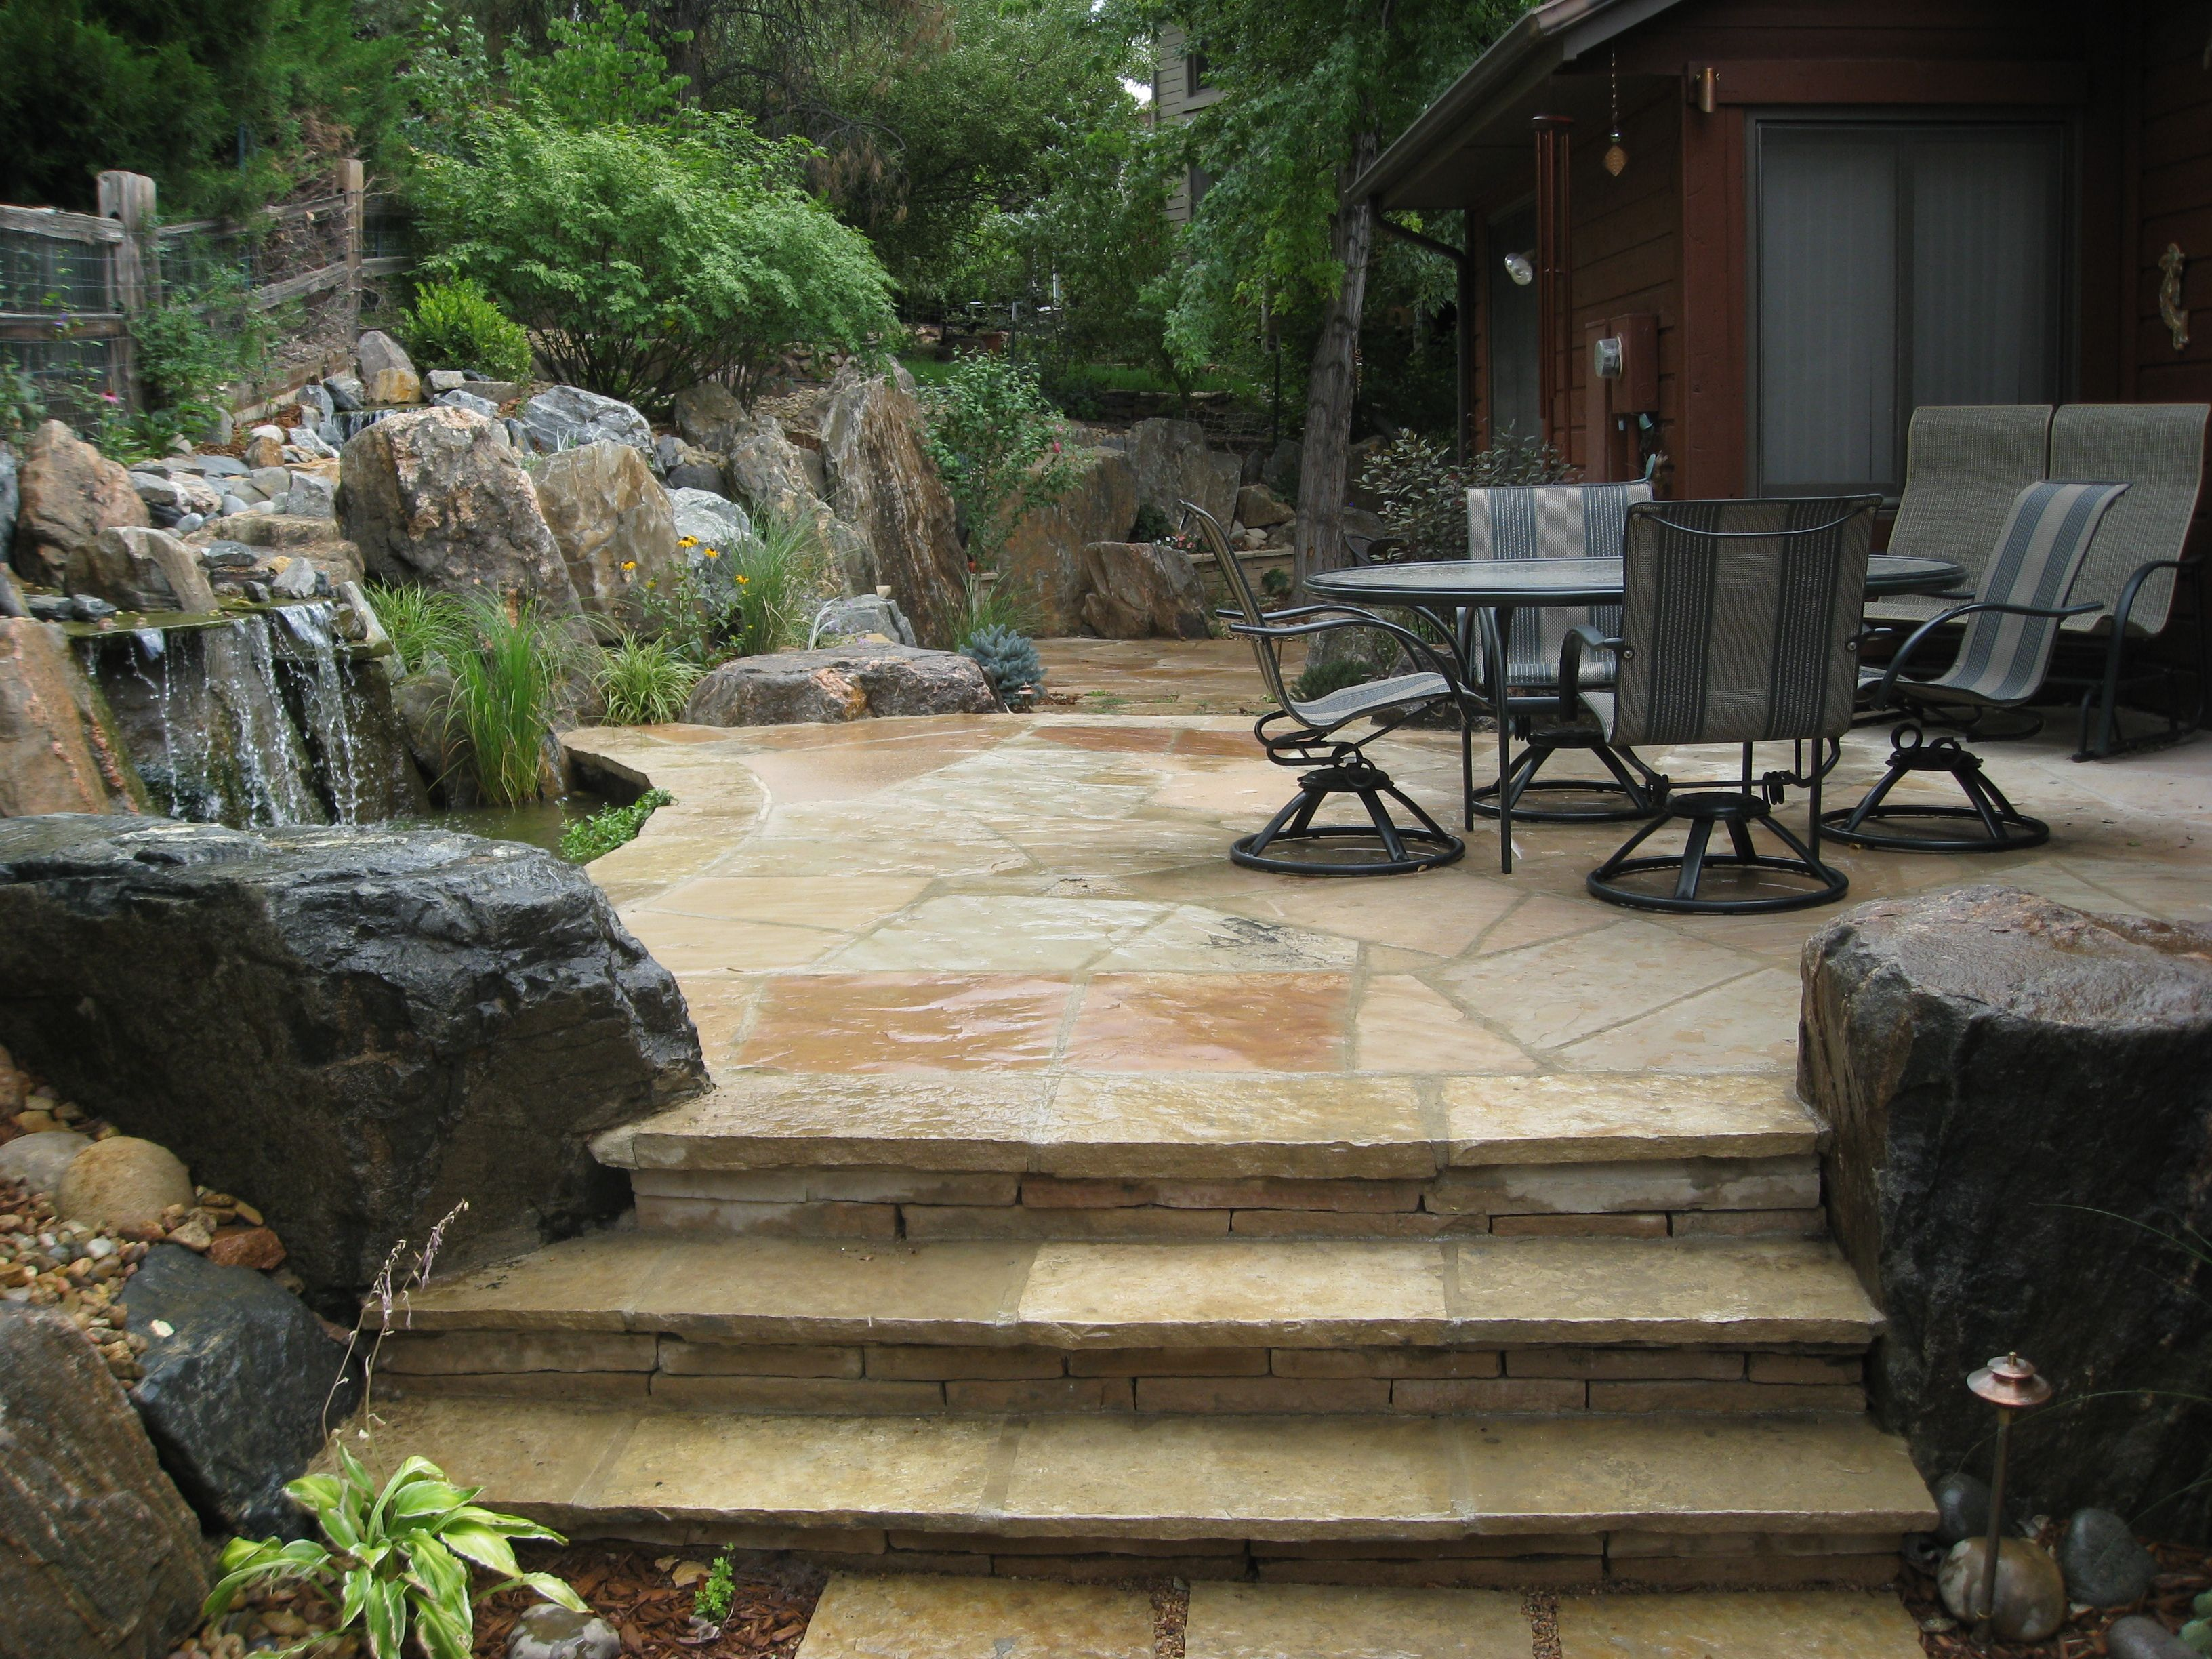 best stone patio ideas - Flagstone Patio Designs